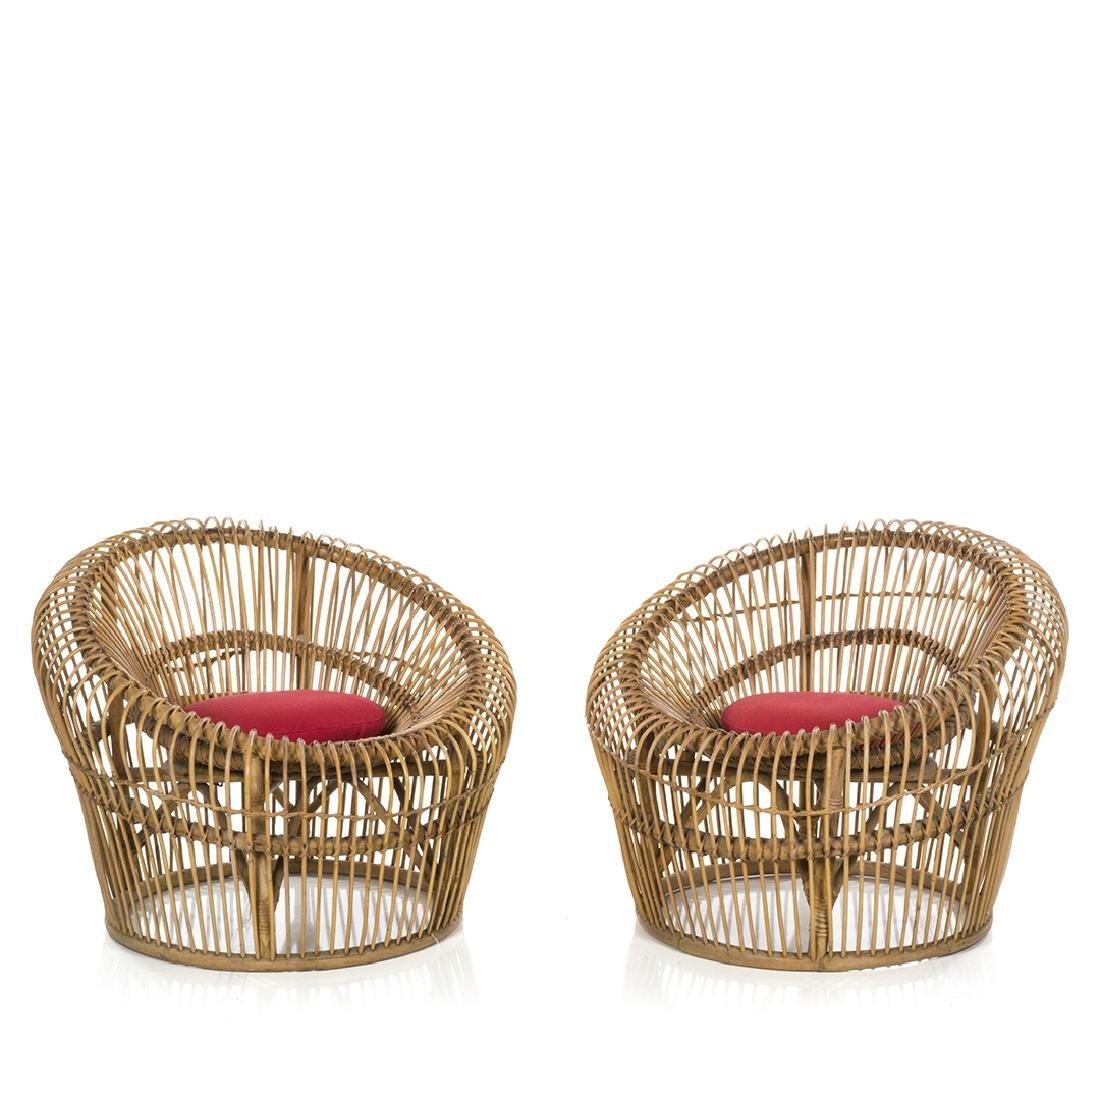 Franco Albini Lounge Chairs (2)